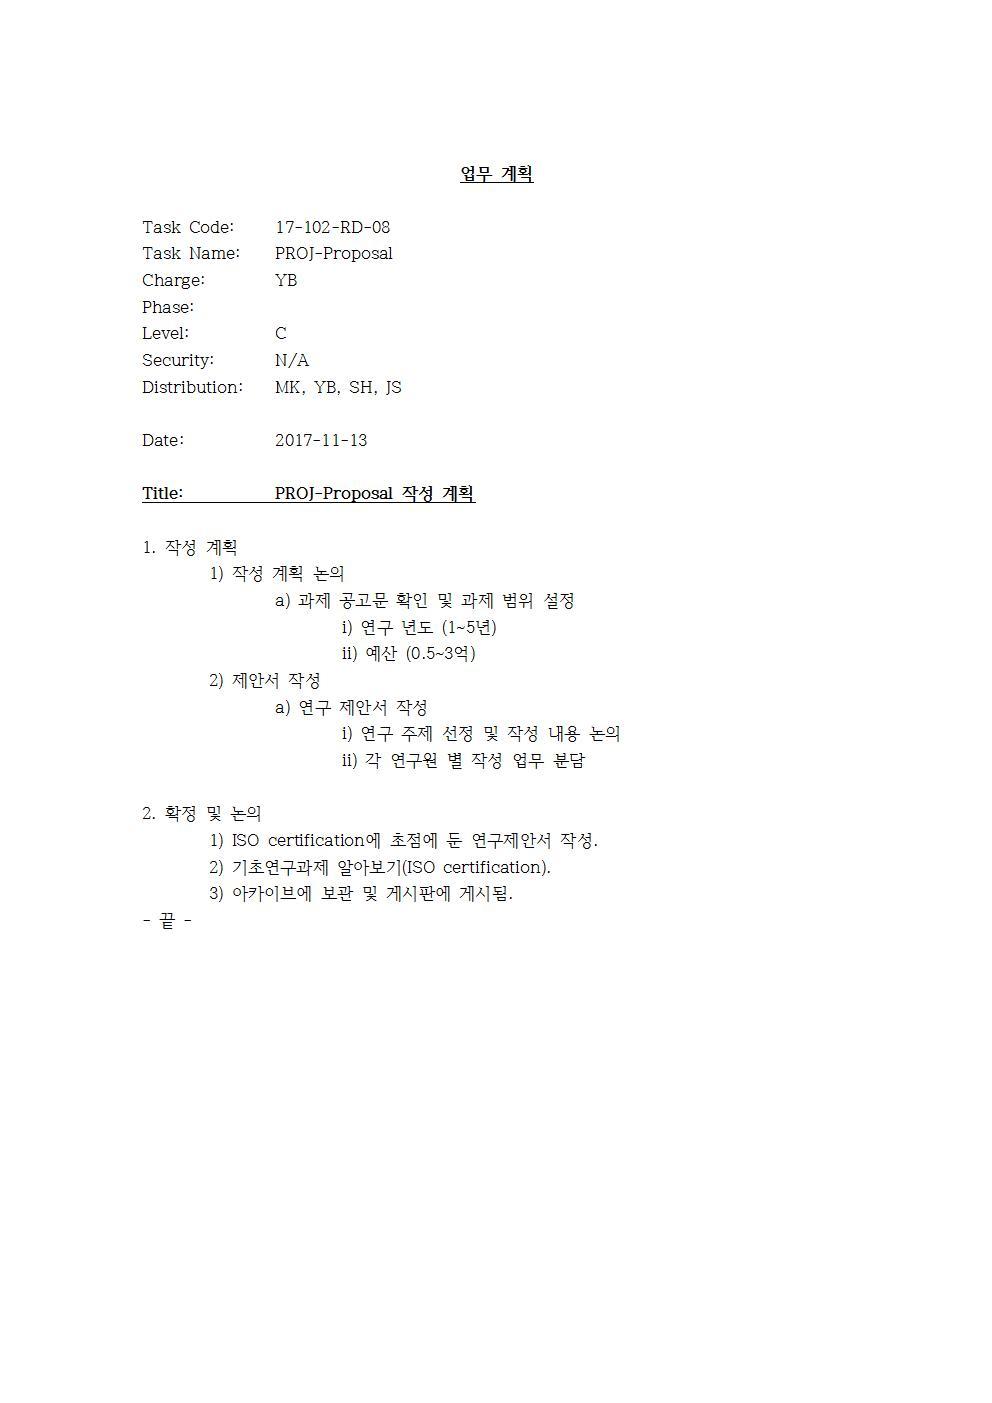 D-[17-102-RD-08]-[PROJ-Proposal]-[YB]-[2017-11-13]001.jpg